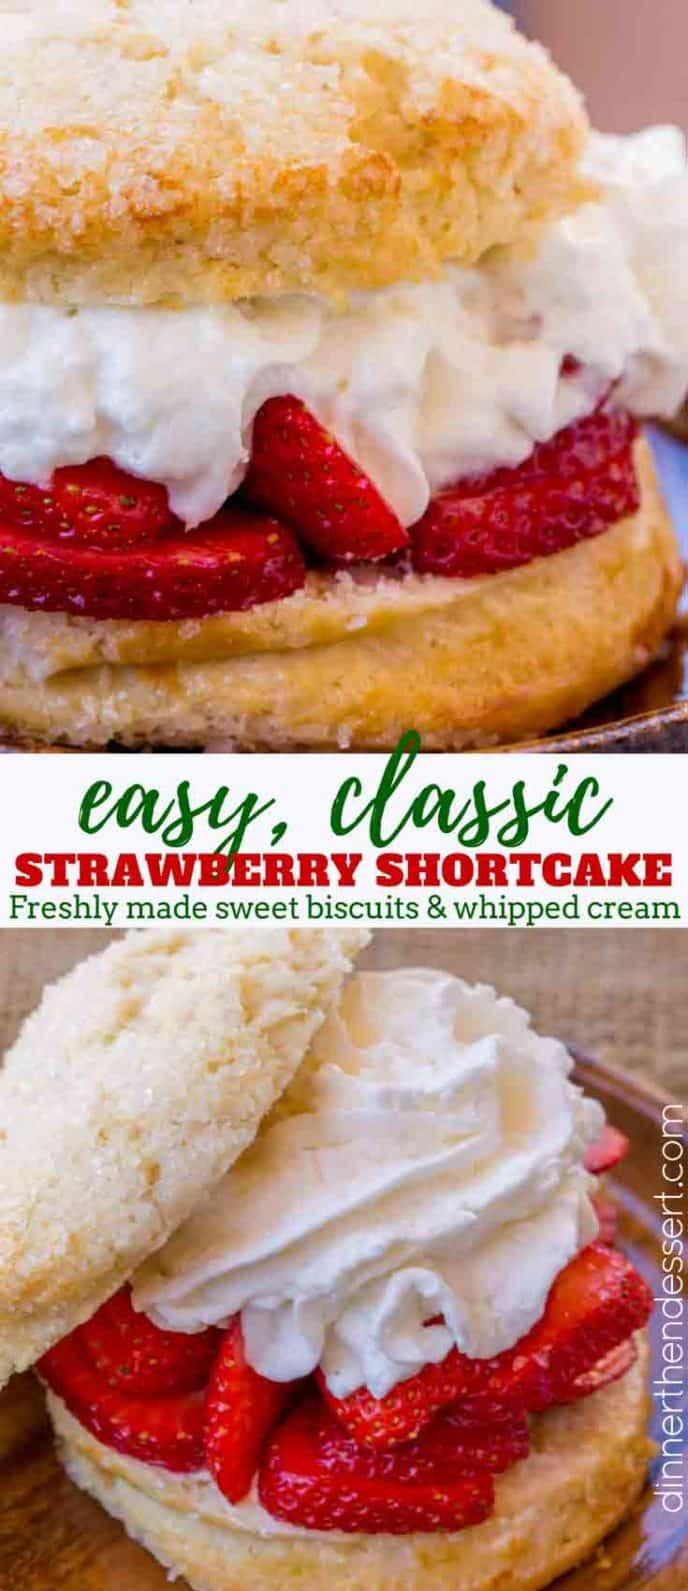 strawberry shortcake collage